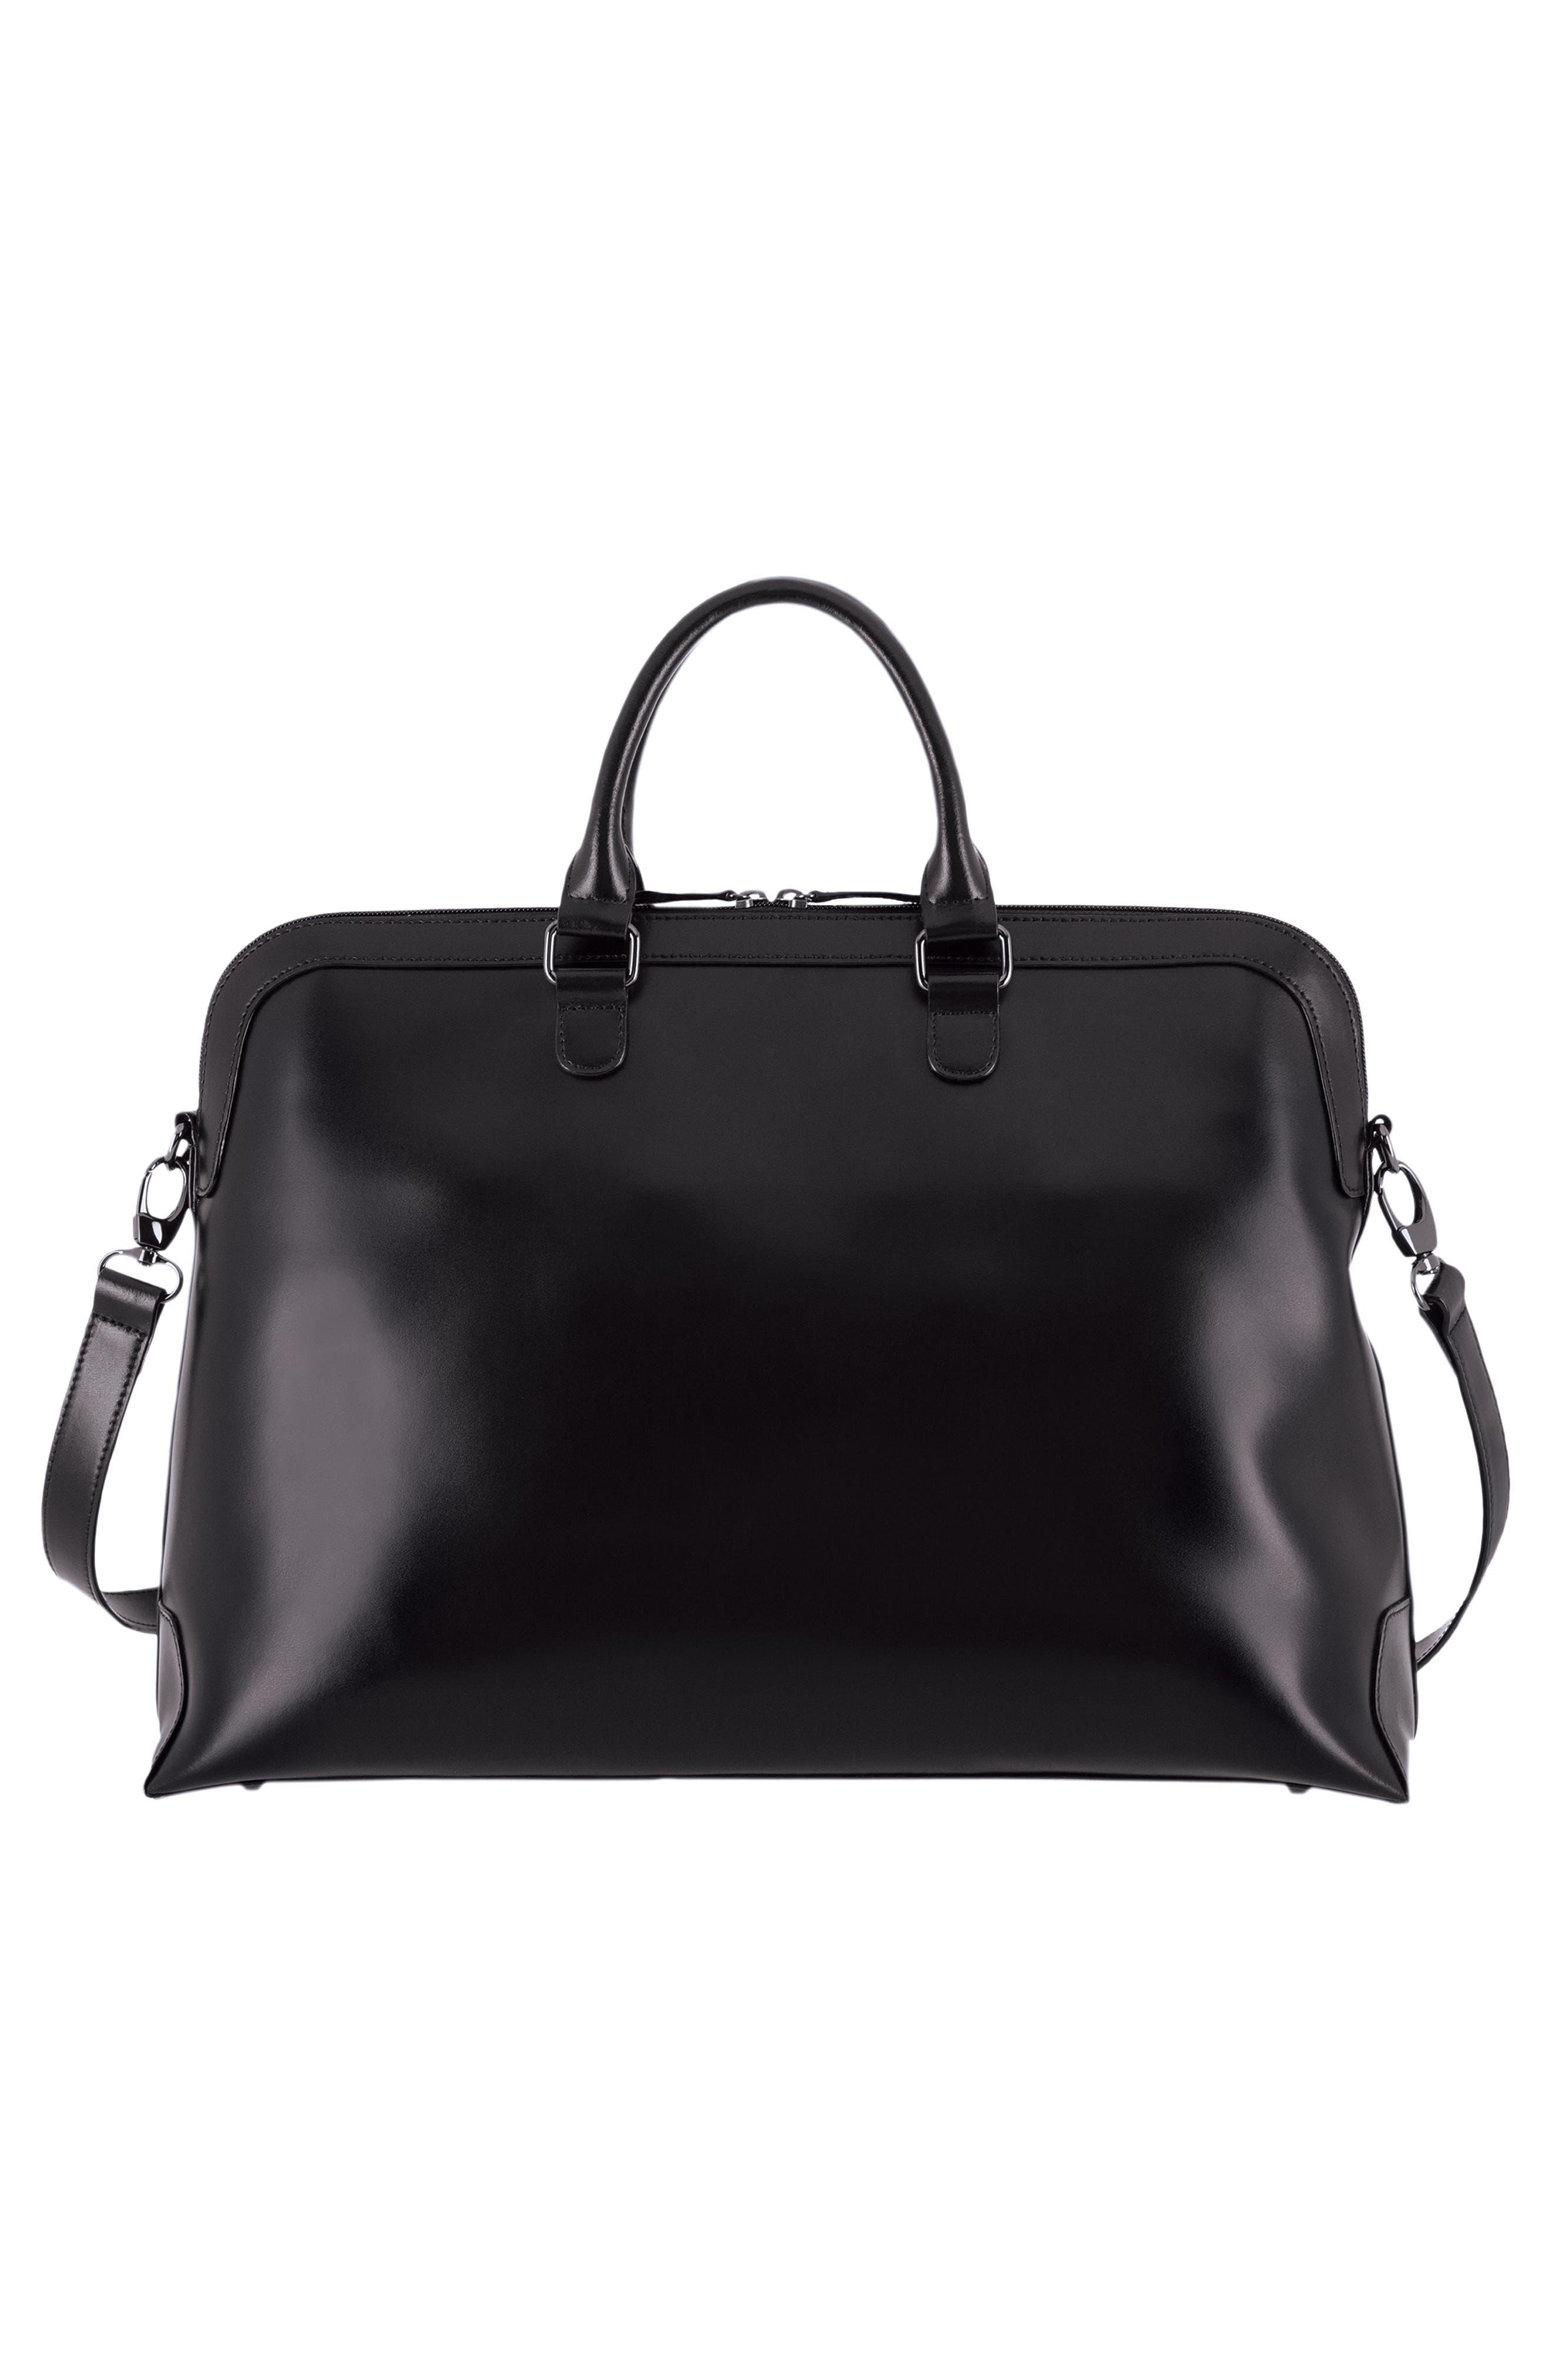 Audrey Under Lock & Key - Brera RFID Leather Briefcase,                             Alternate thumbnail 2, color,                             BLACK/ BLACK